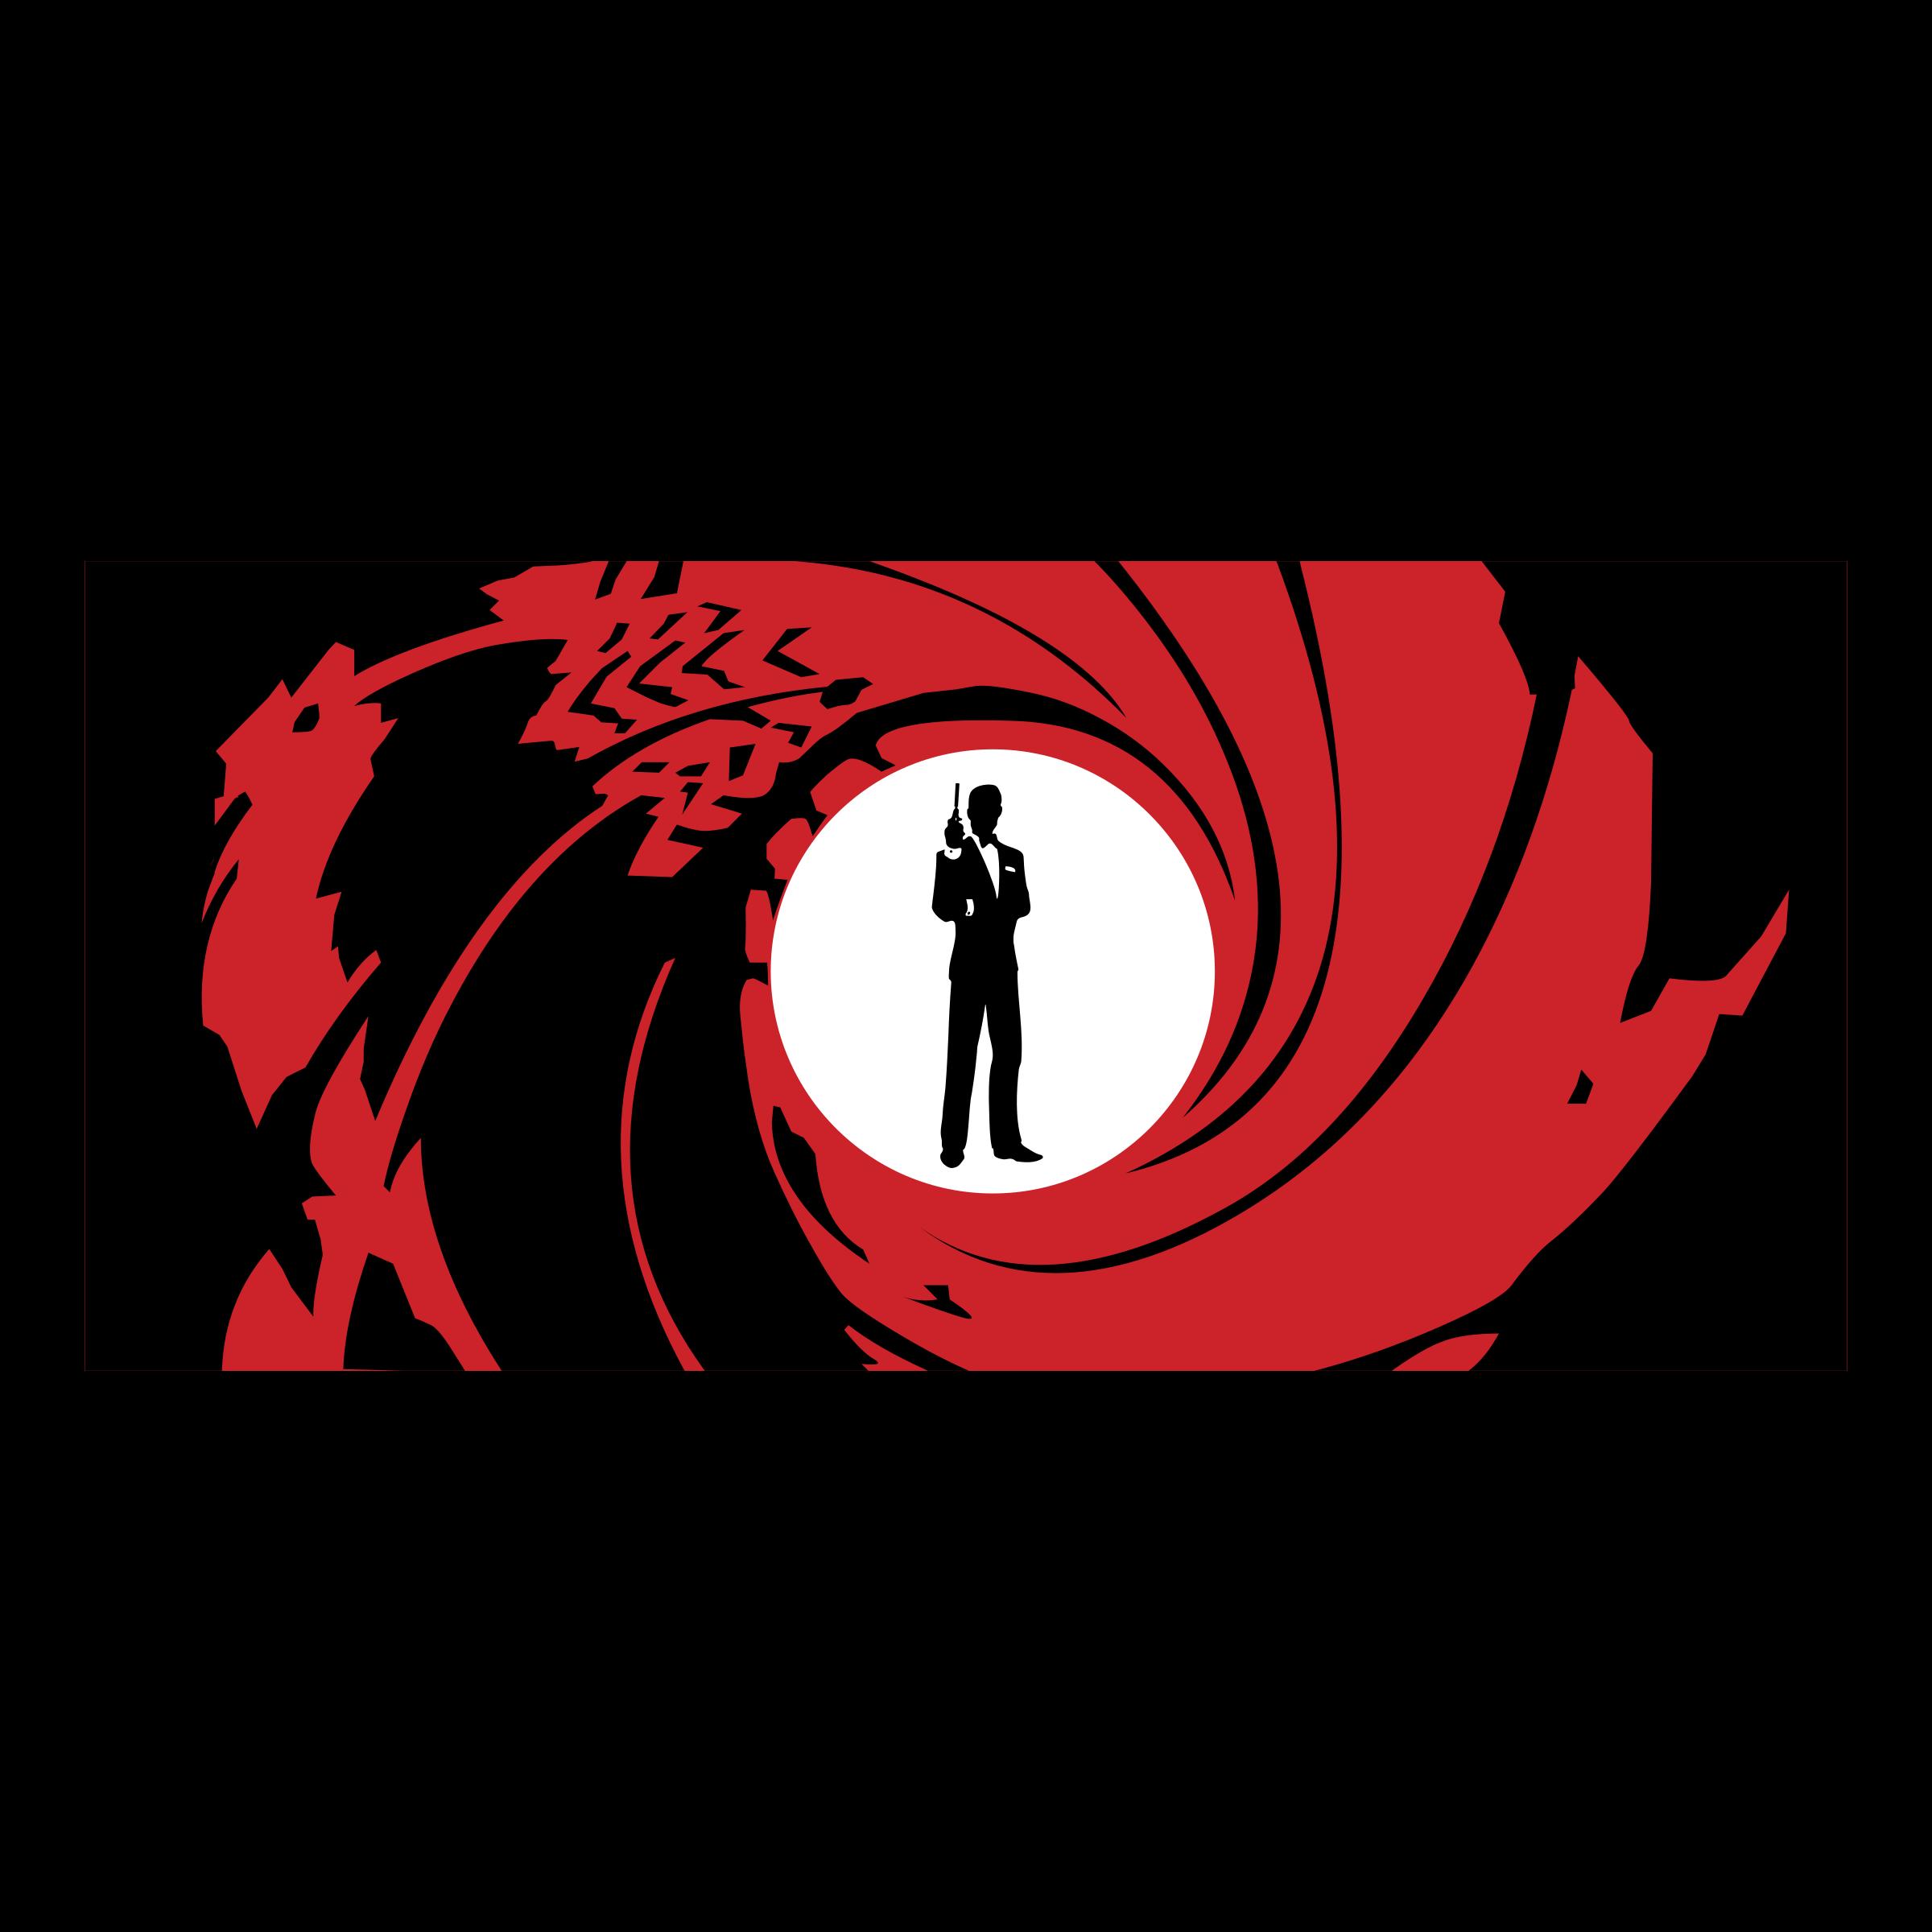 2400x2400 James Bond 007 Logo Png Transparent Amp Svg Vector